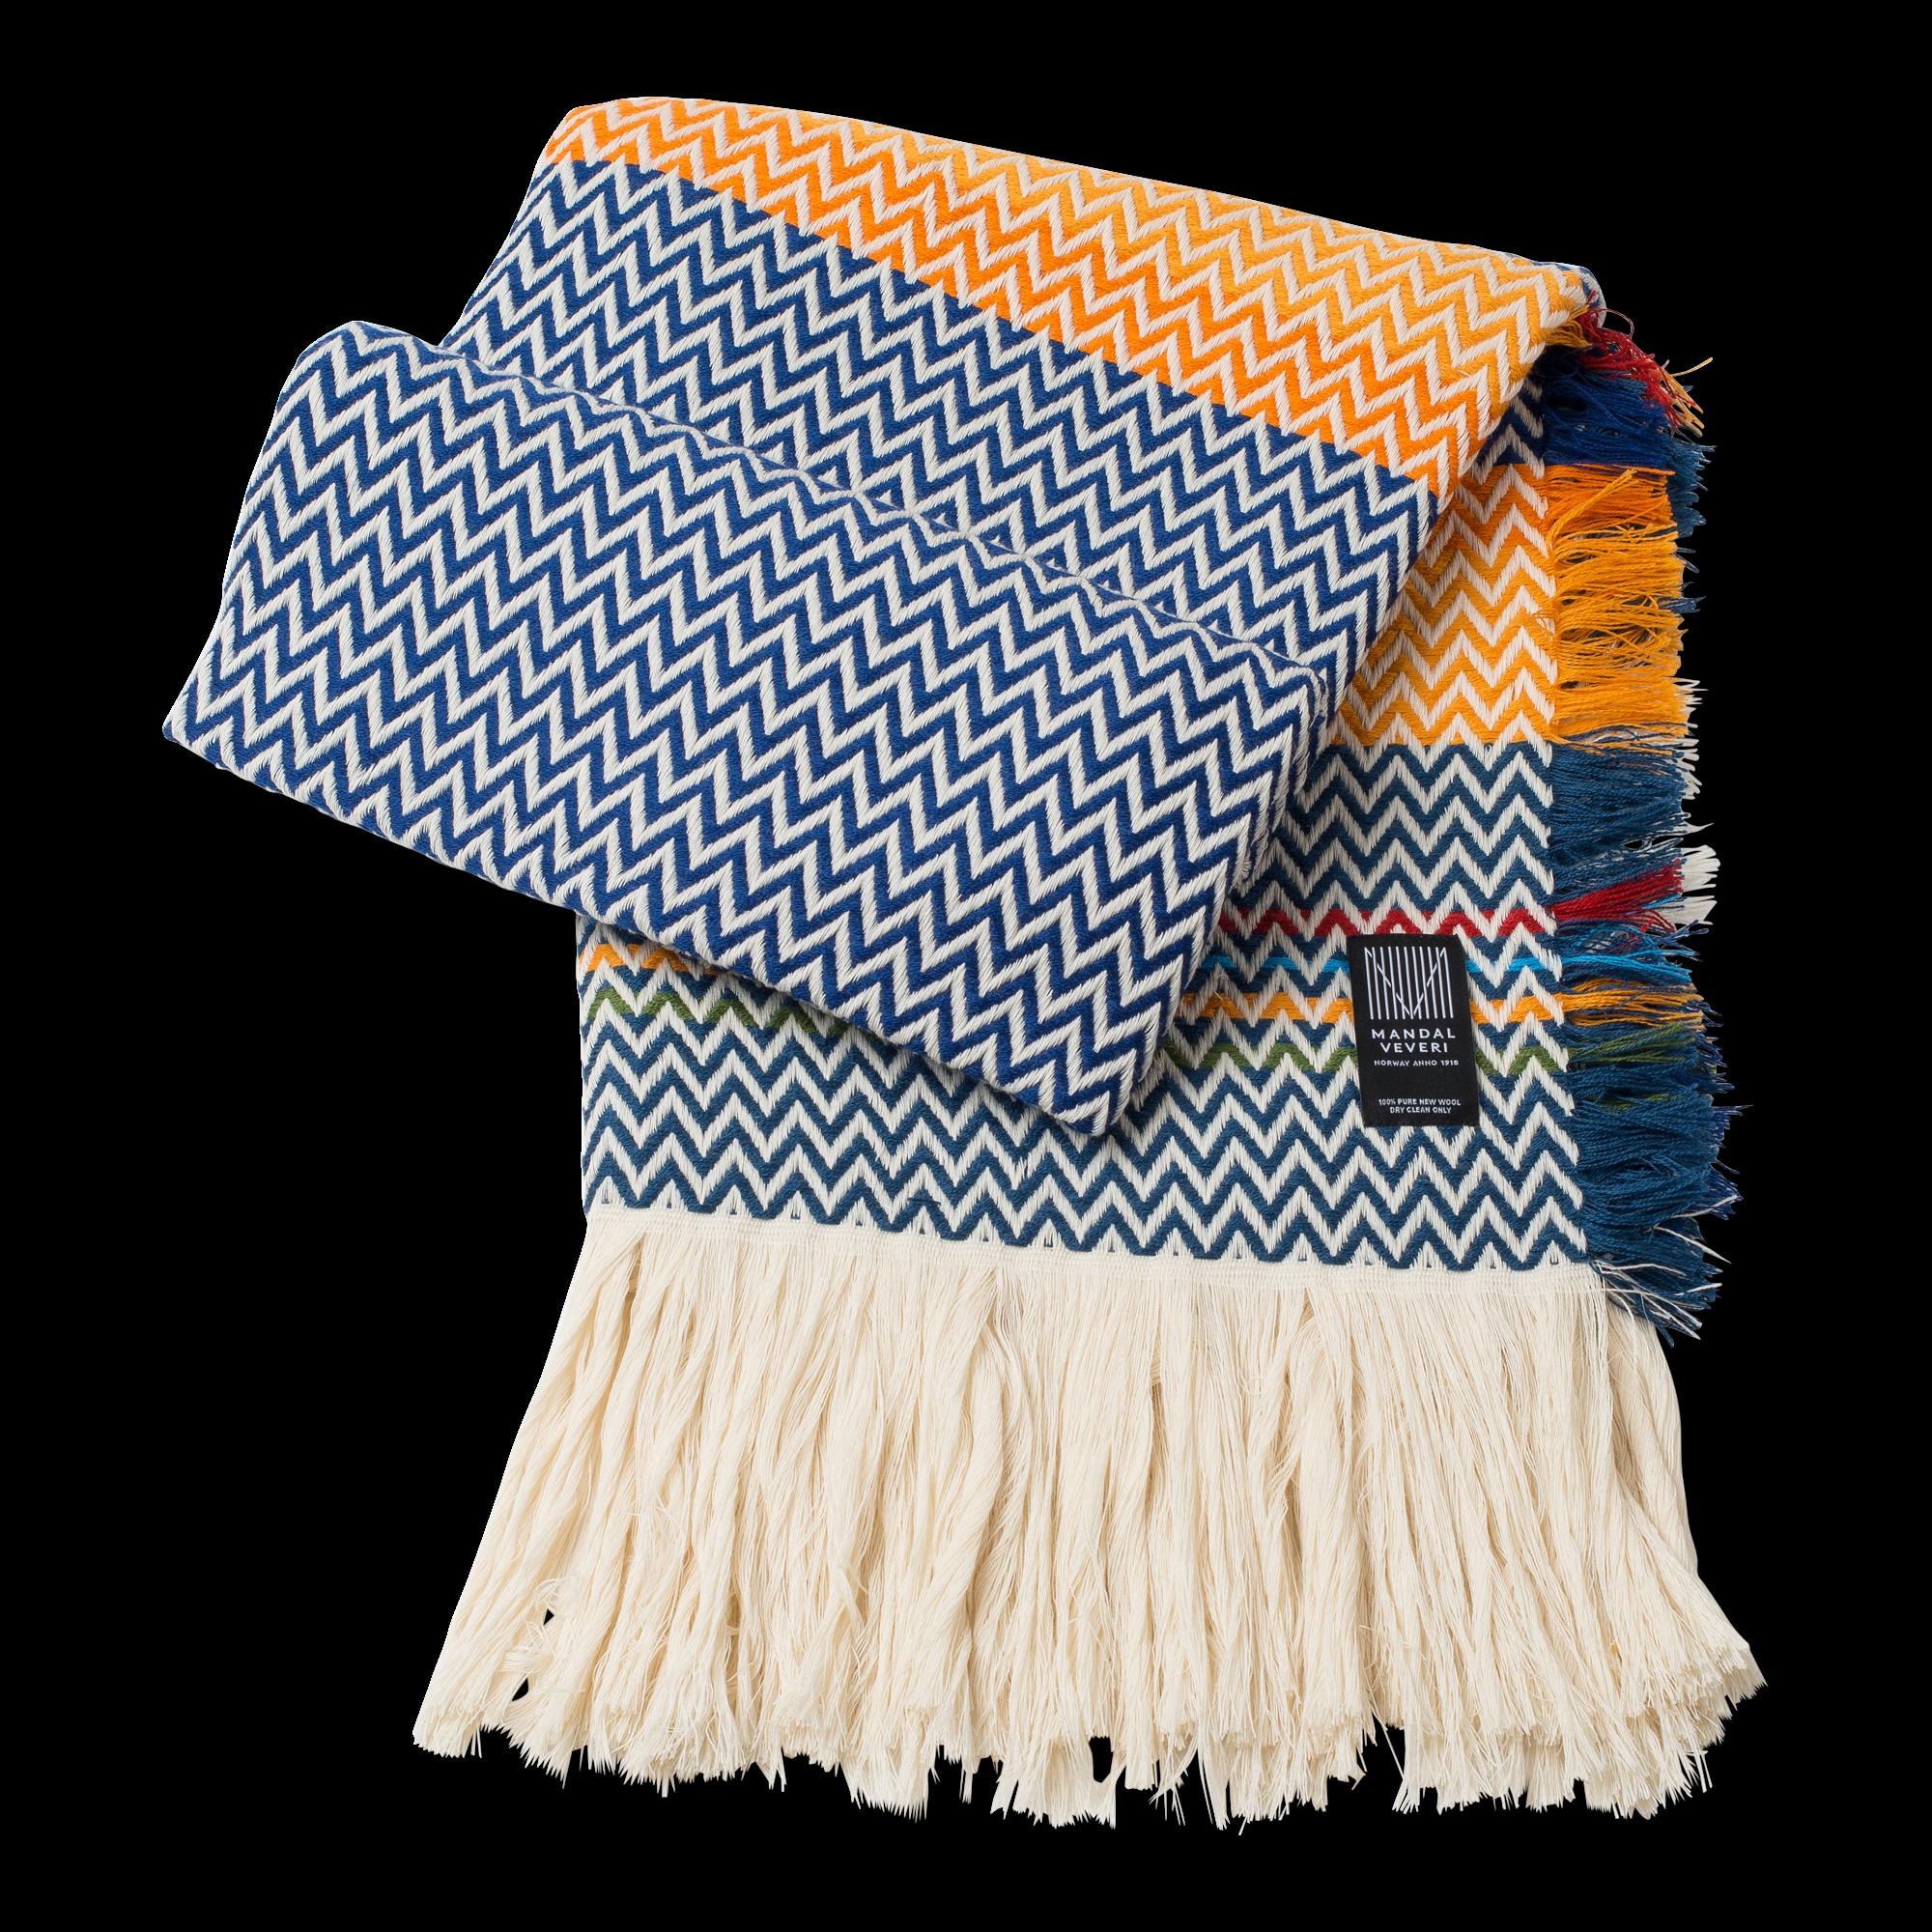 bunad-blanket-nordland-fram-oslo